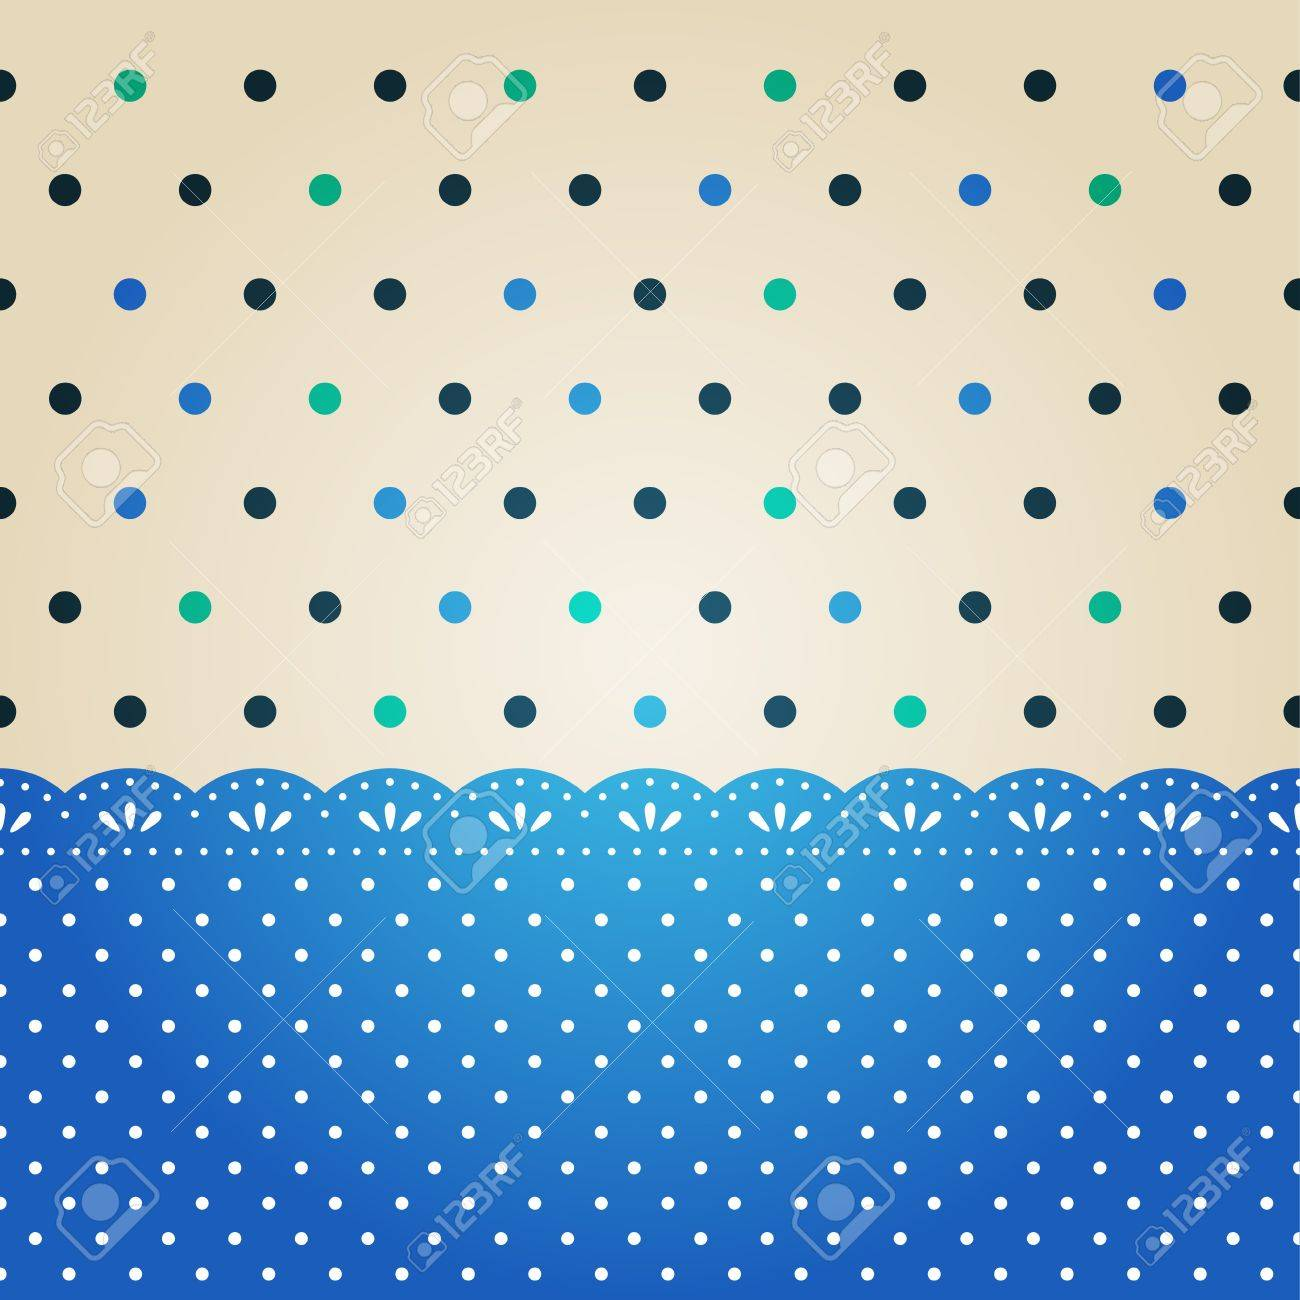 Pretty Polka Dots Backgrounds Vector Polka Dot Background